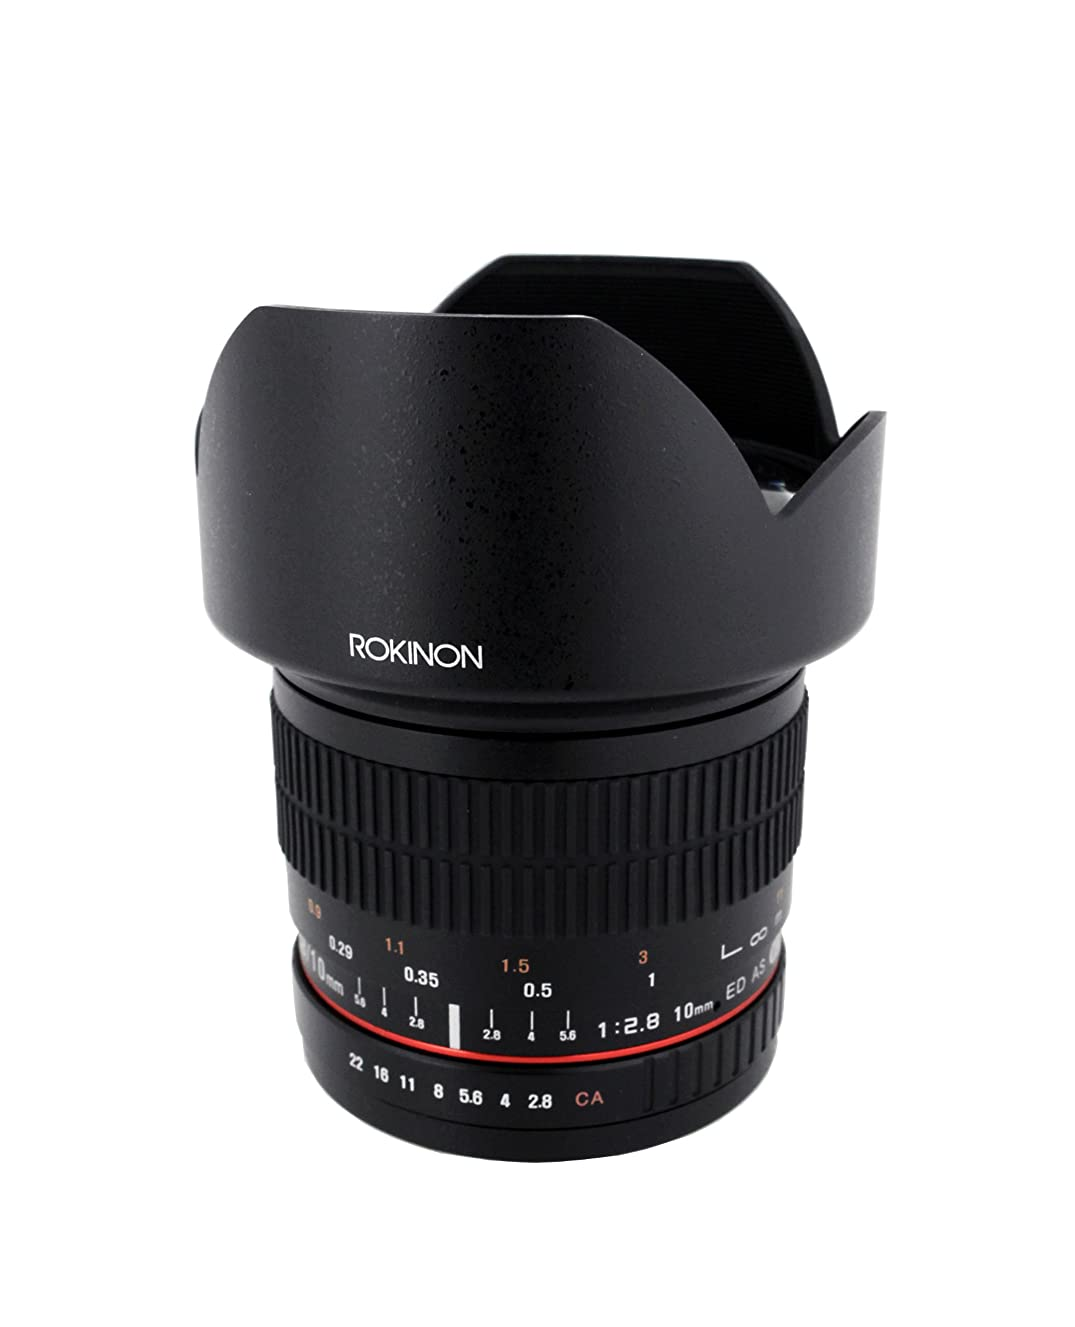 Rokinon 10mm F2.8 ED AS NCS CS Ultra Wide Angle Lens for Olympus and Panasonic Micro 4/3 (MFT) Mount Digital Cameras  (10M-MFT)